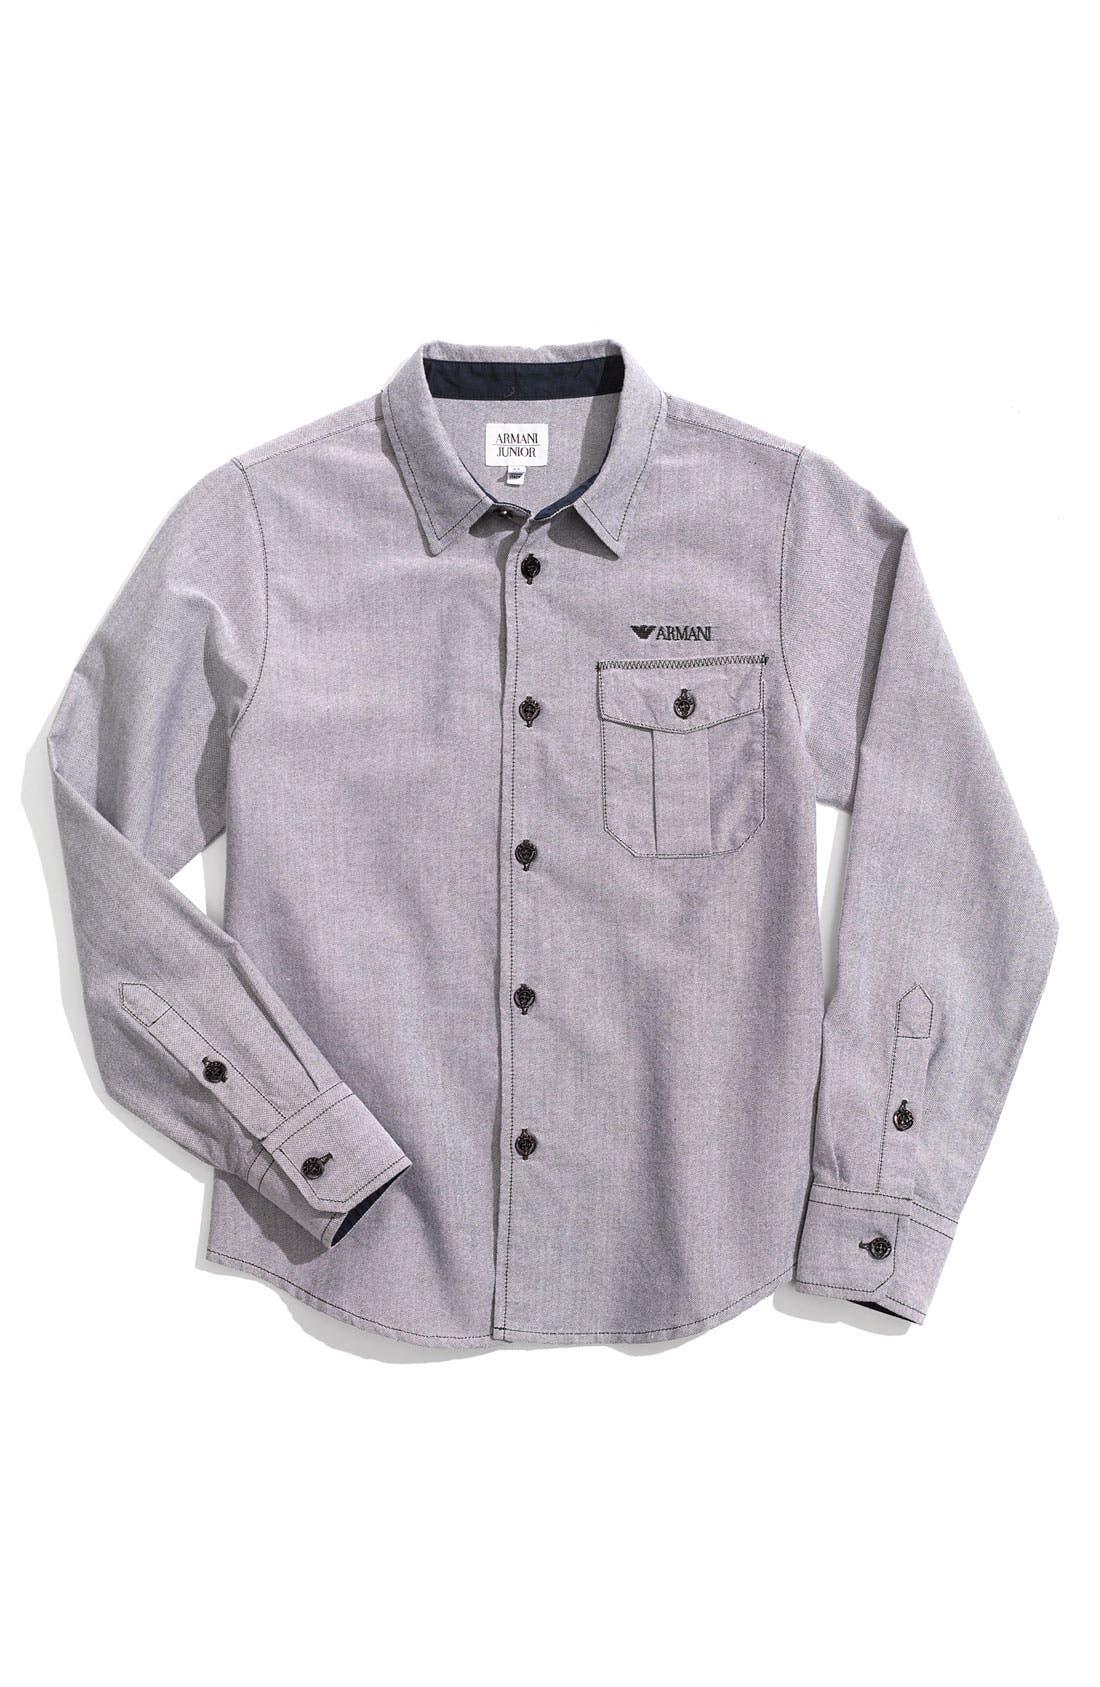 Alternate Image 1 Selected - Armani Junior Shirt (Little Boys)